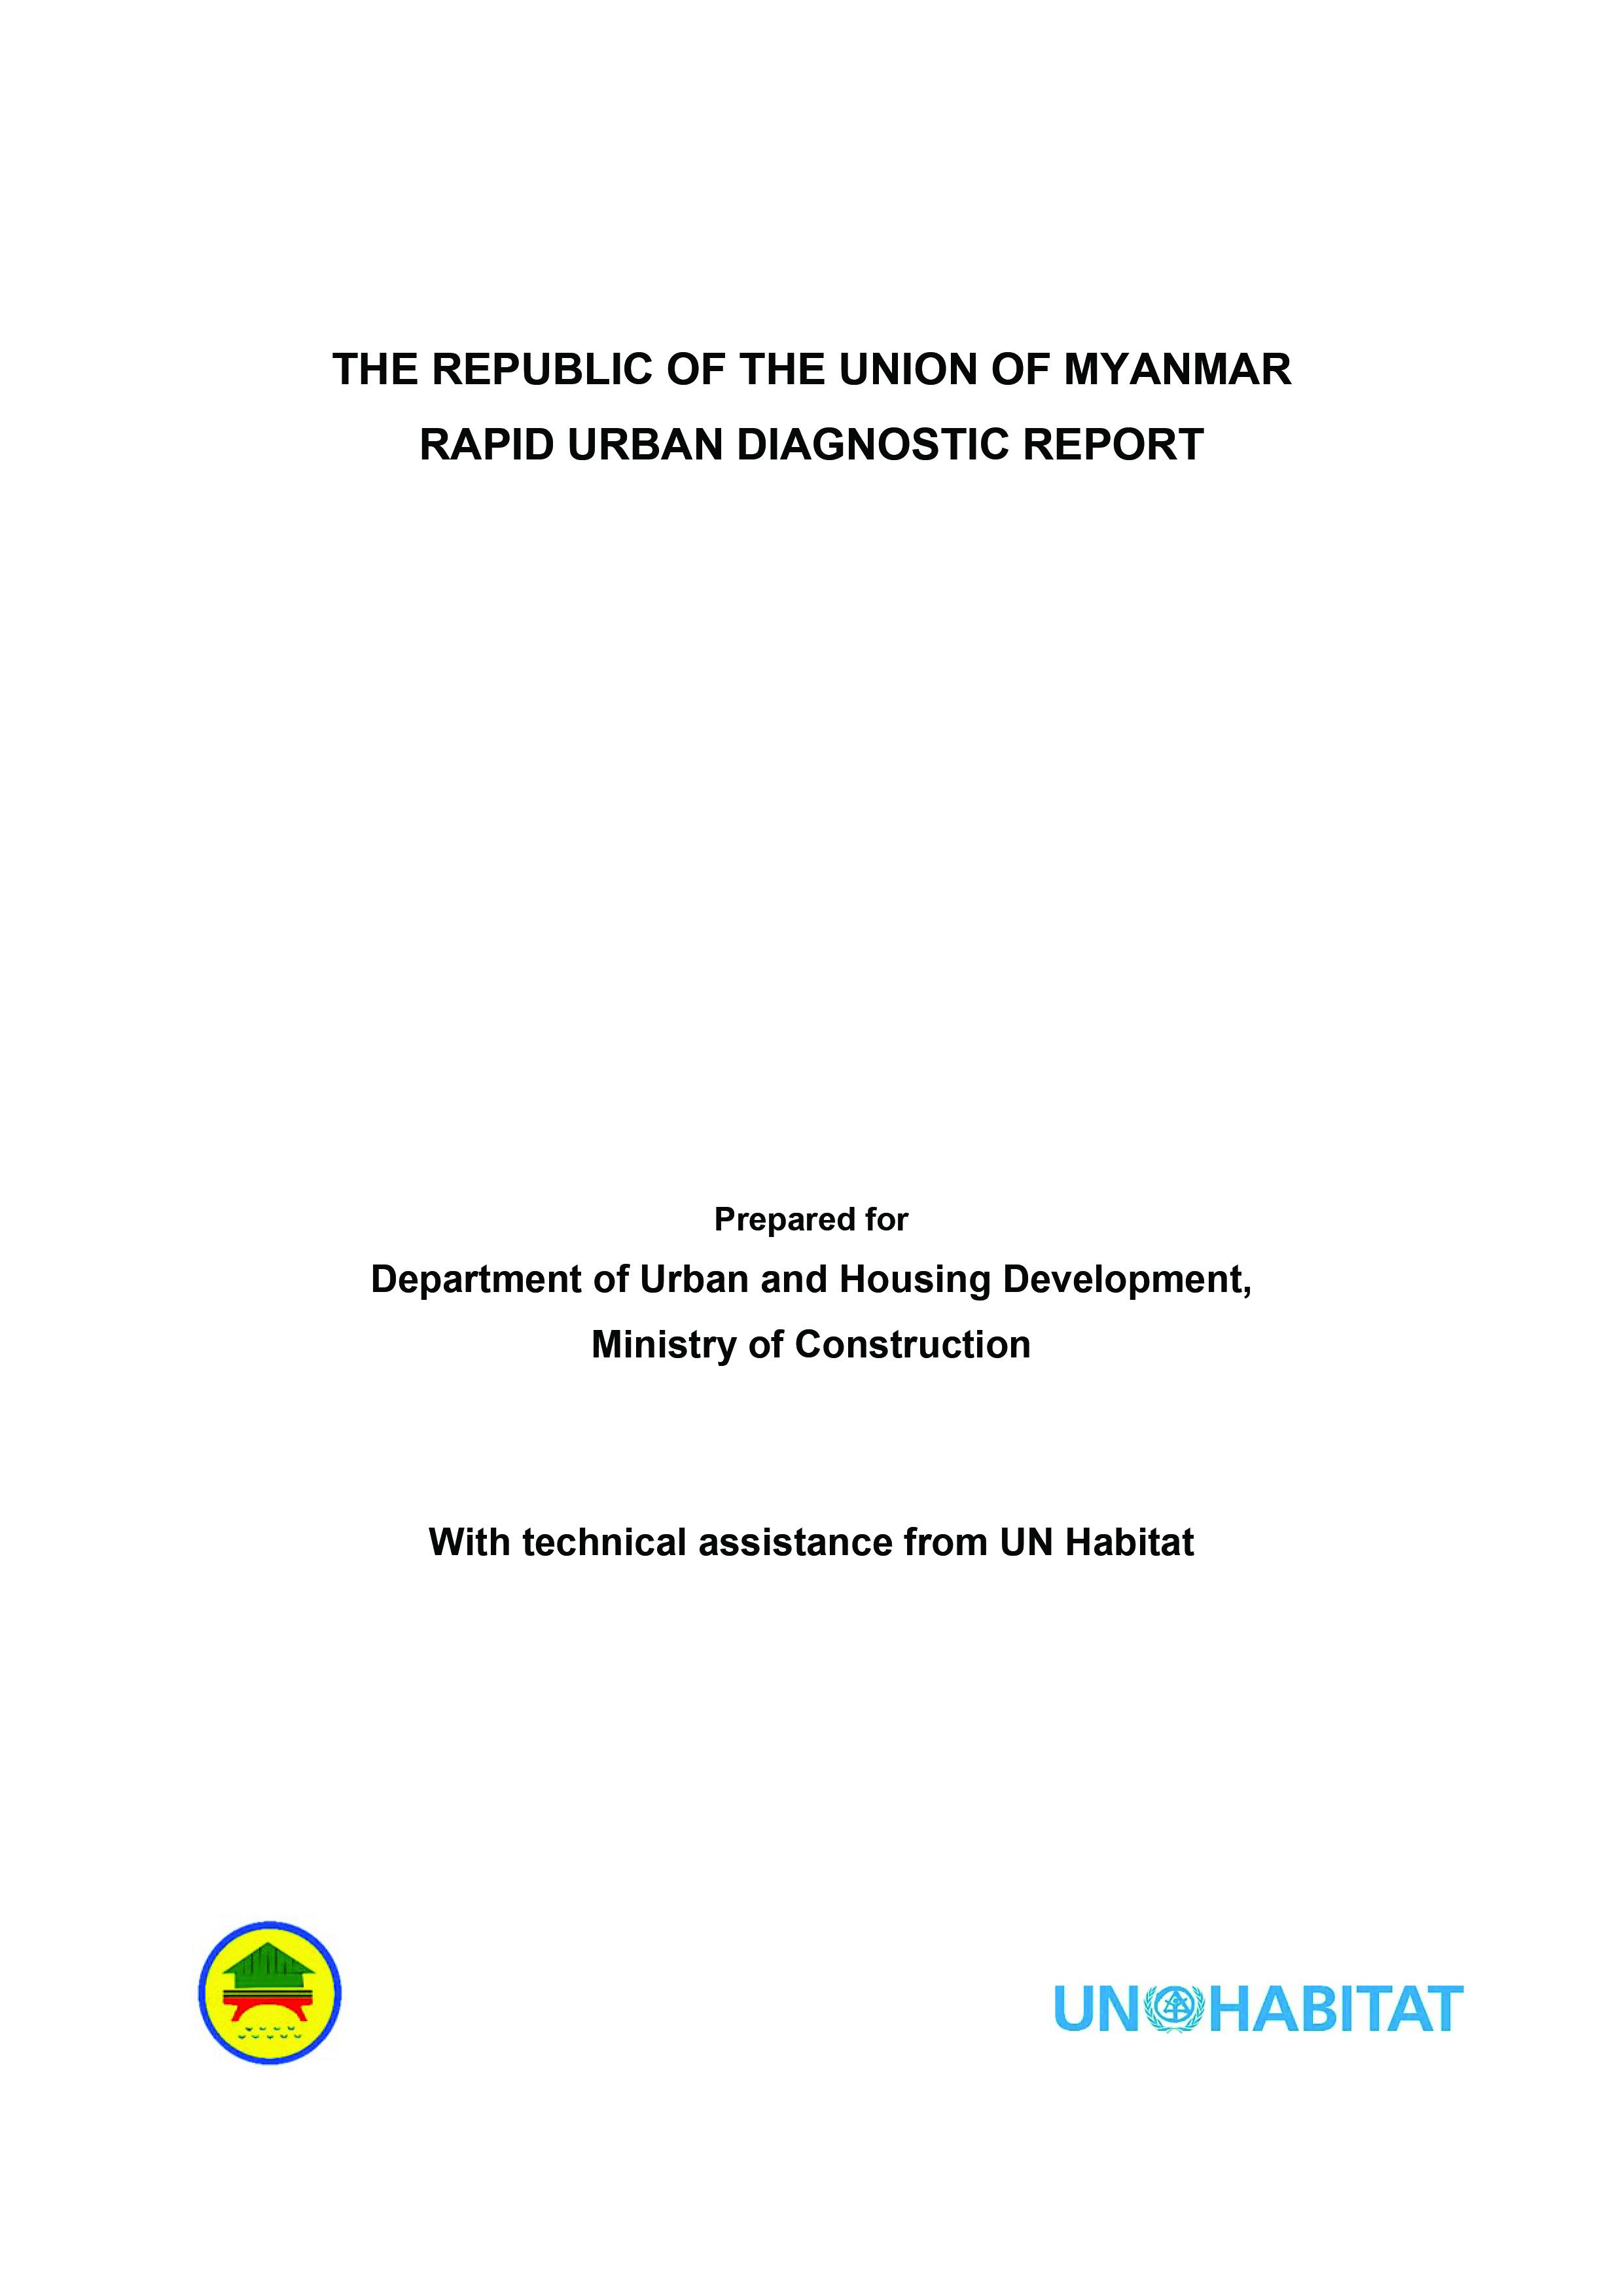 Rapid Urban Diagnostic Report